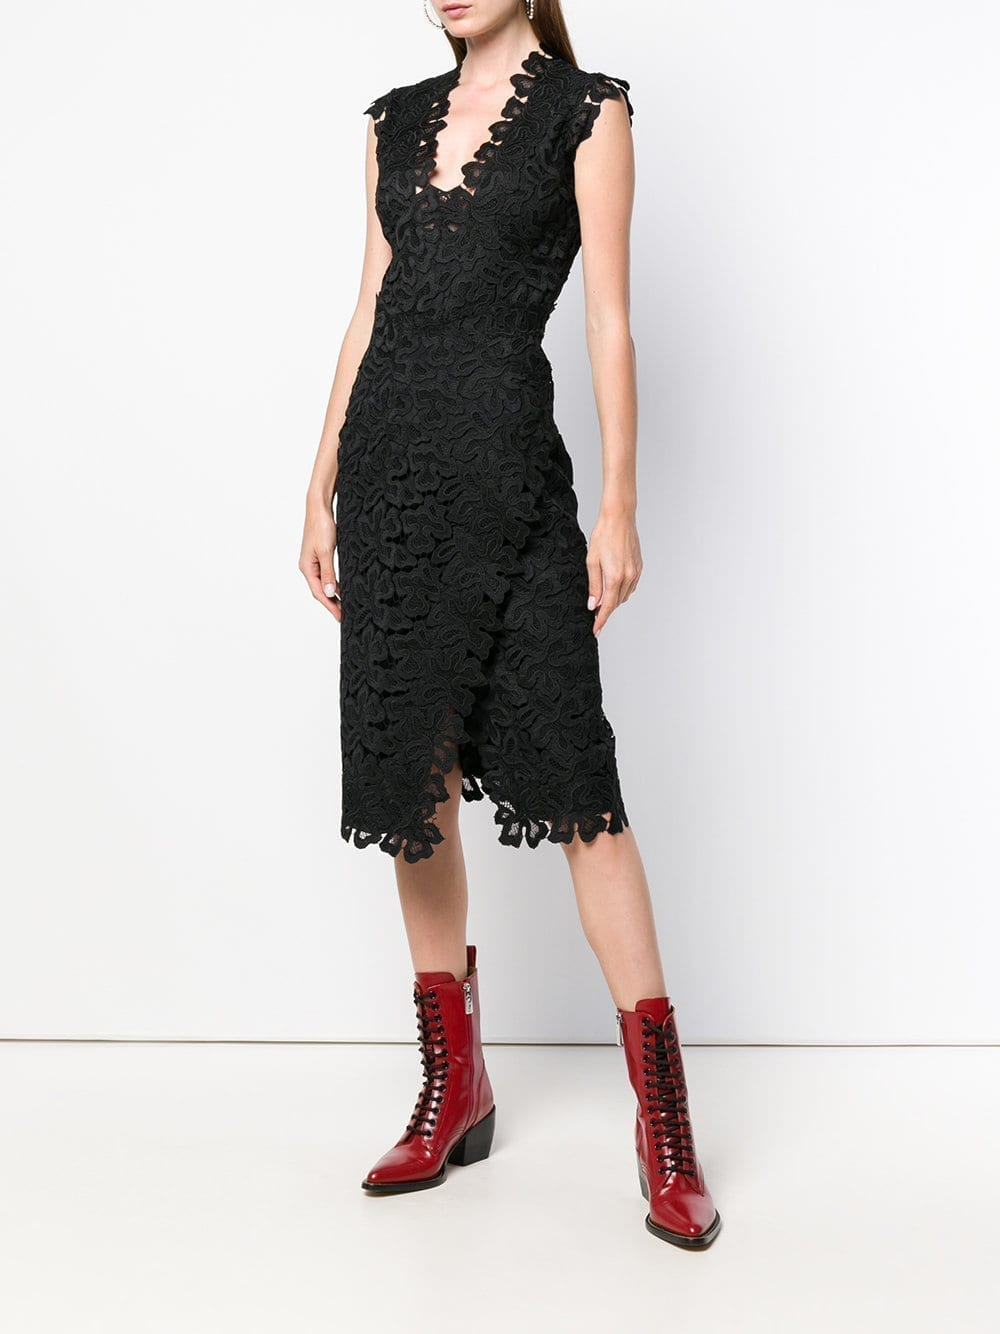 ERMANNO SCERVINO Lace Embroidered Shift Black Dress